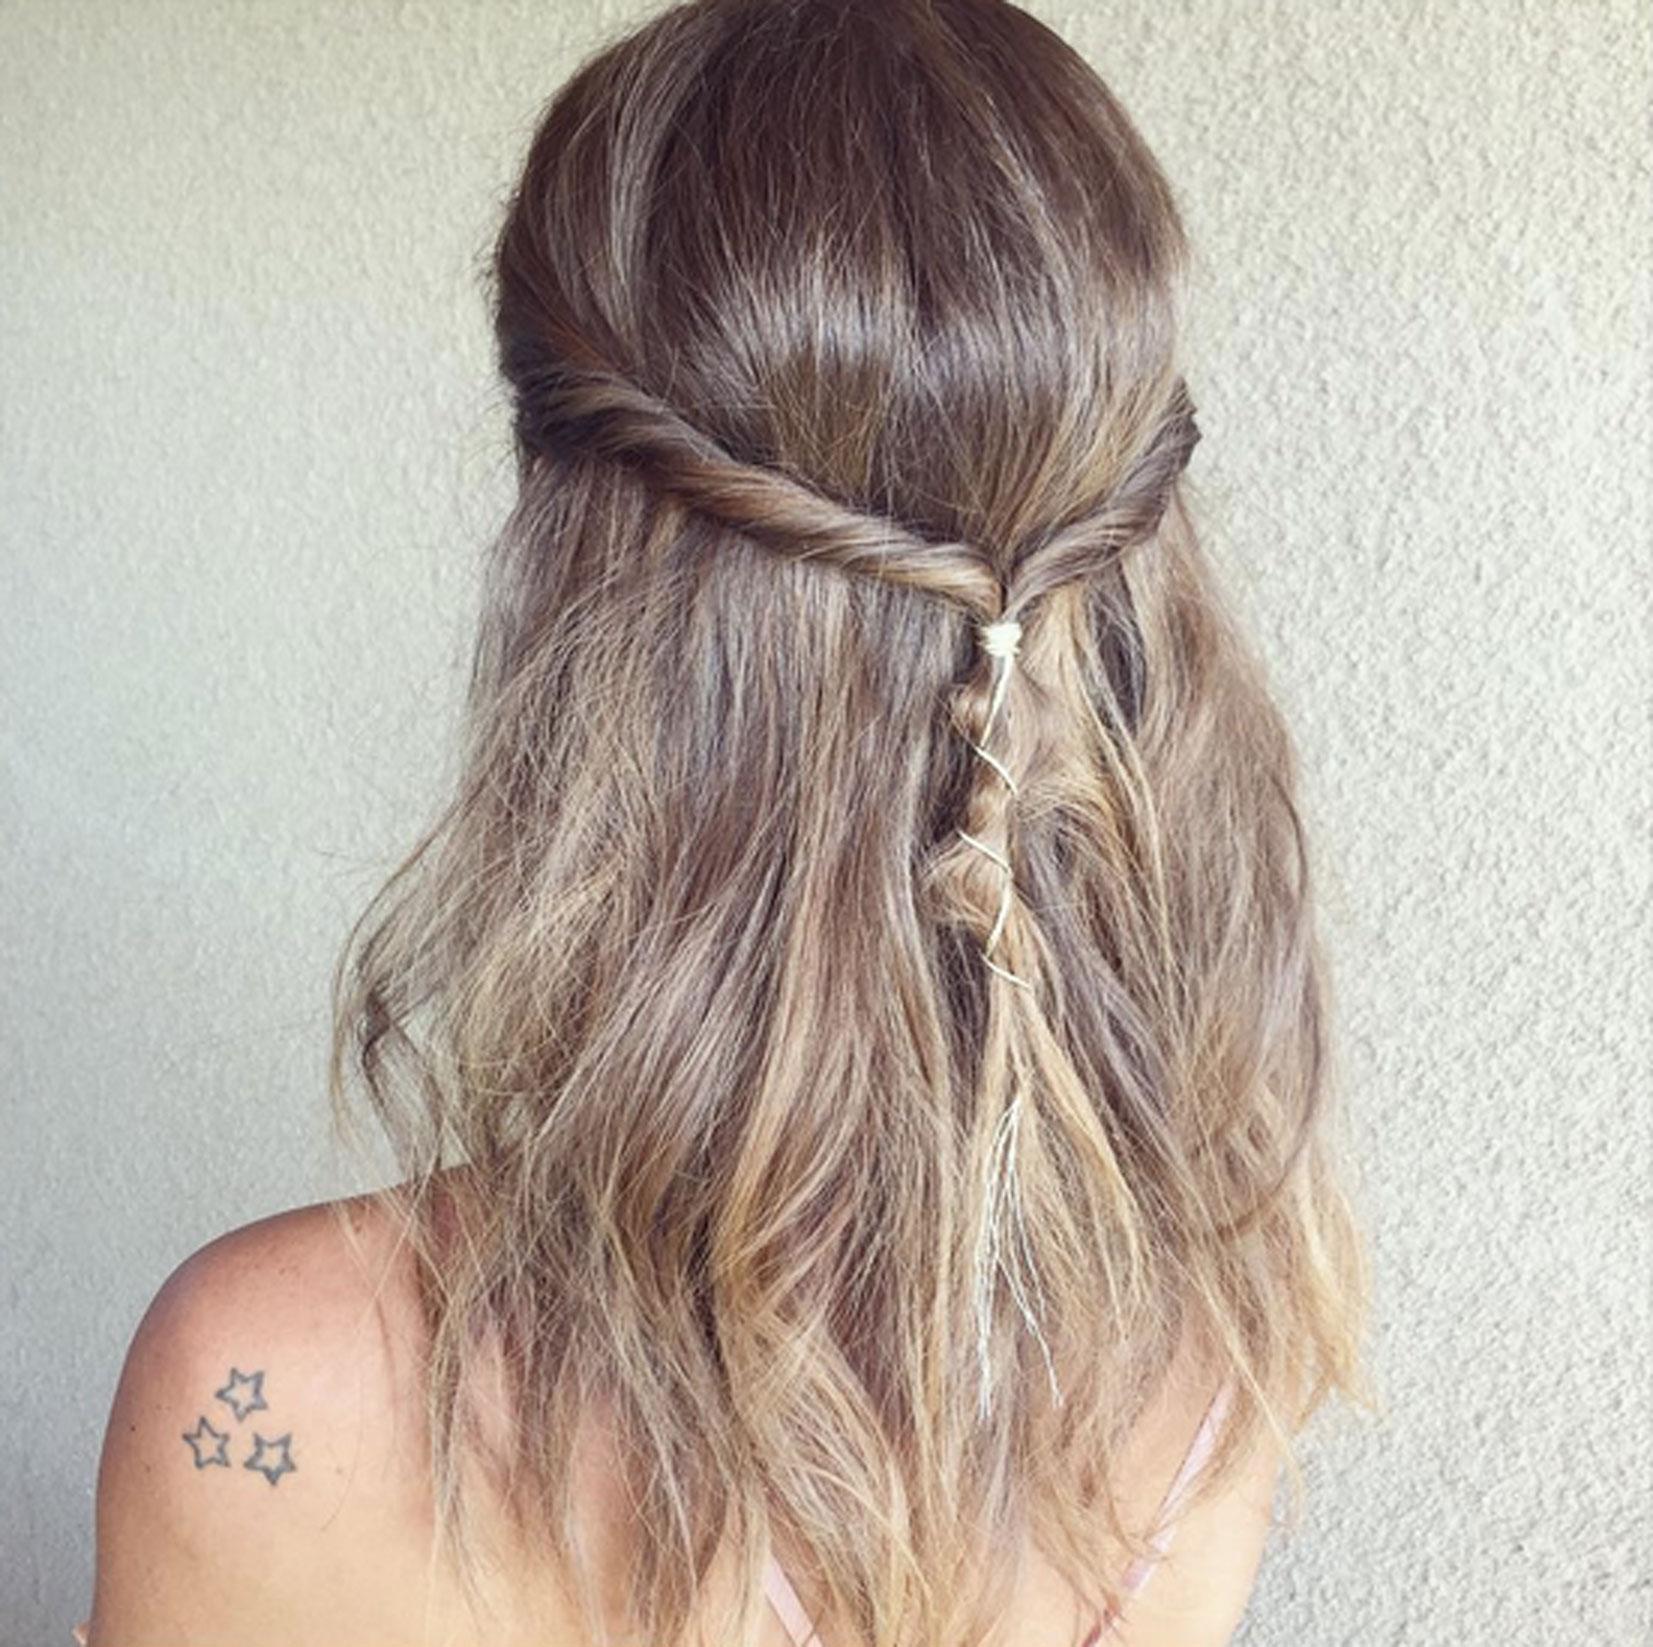 Frisuren Inspiration Millie Mackintosh S Coachella Boho Style